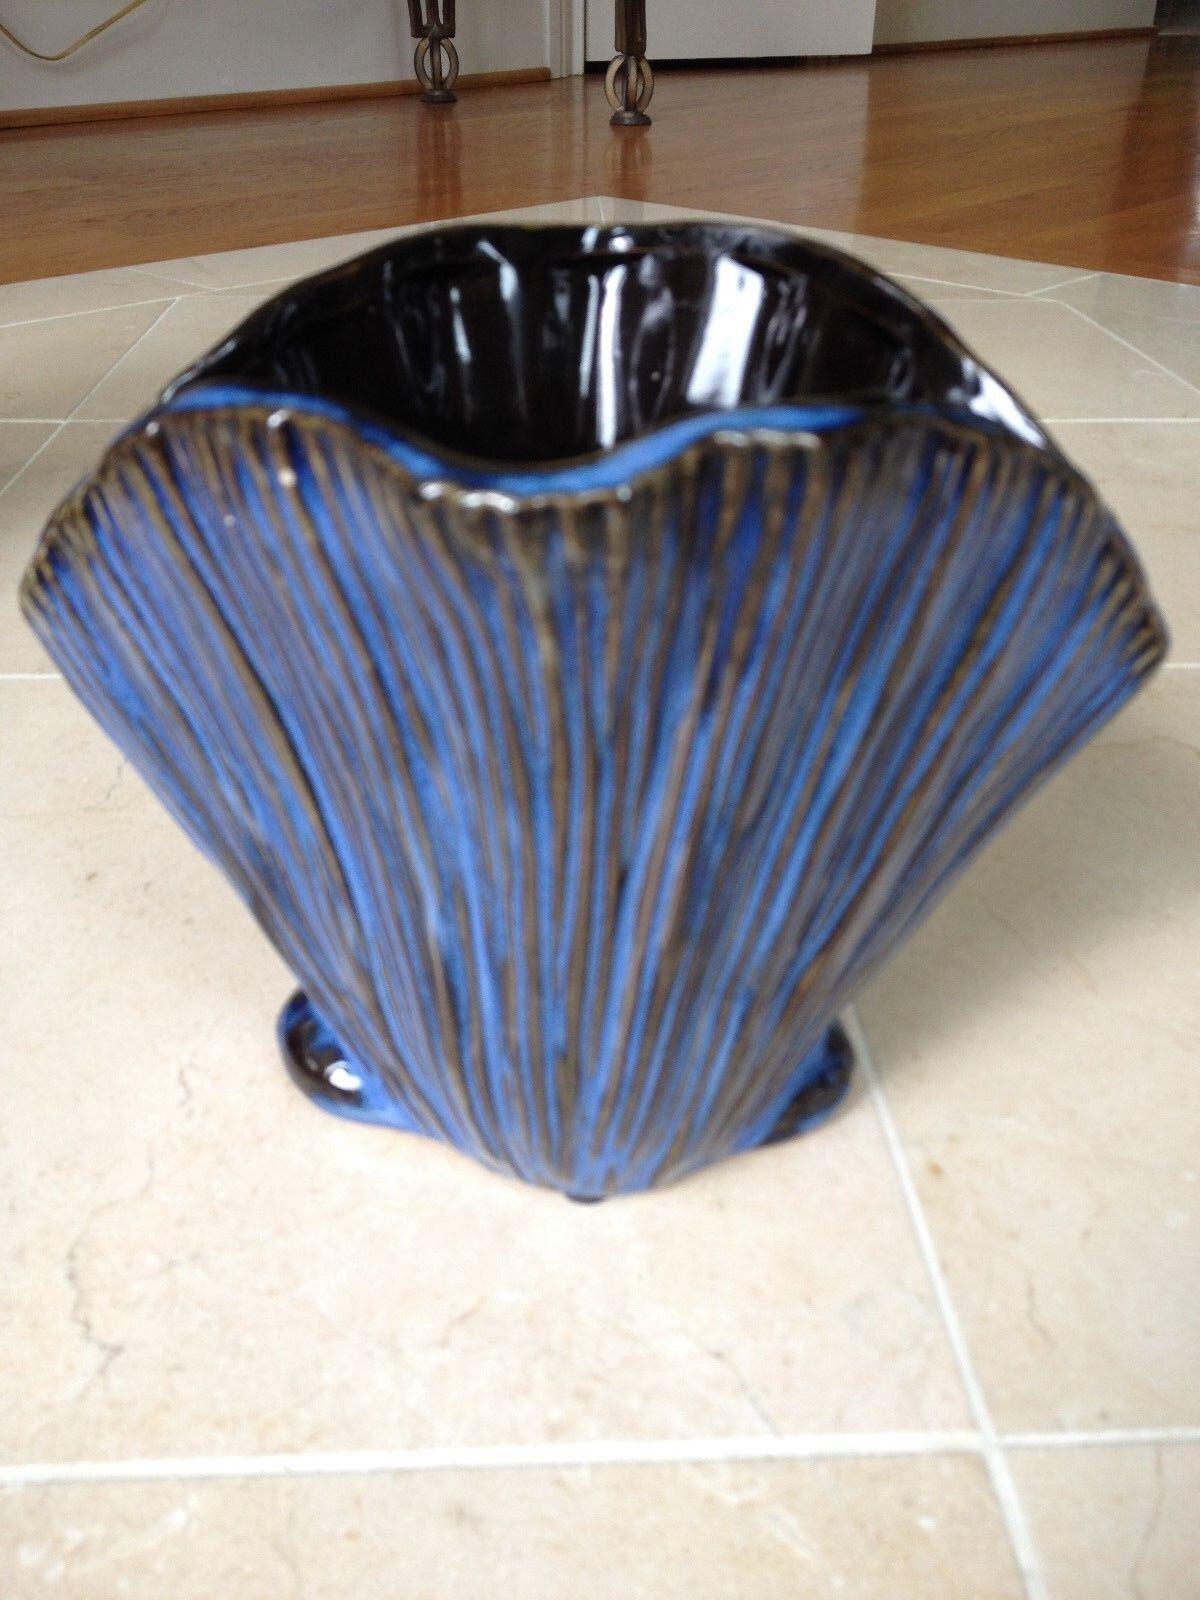 Three Hands Corp Scalloped Blau Seashell Ceramic Vase